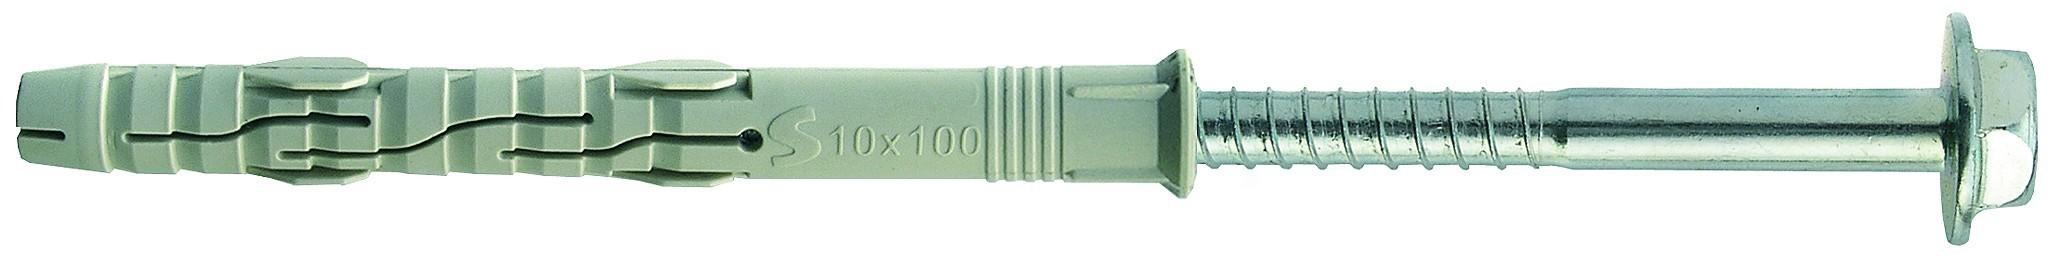 hmoždinka 10x140 RMST rámová + vrut 6hranná hlava s límcem torx, ETA-CE